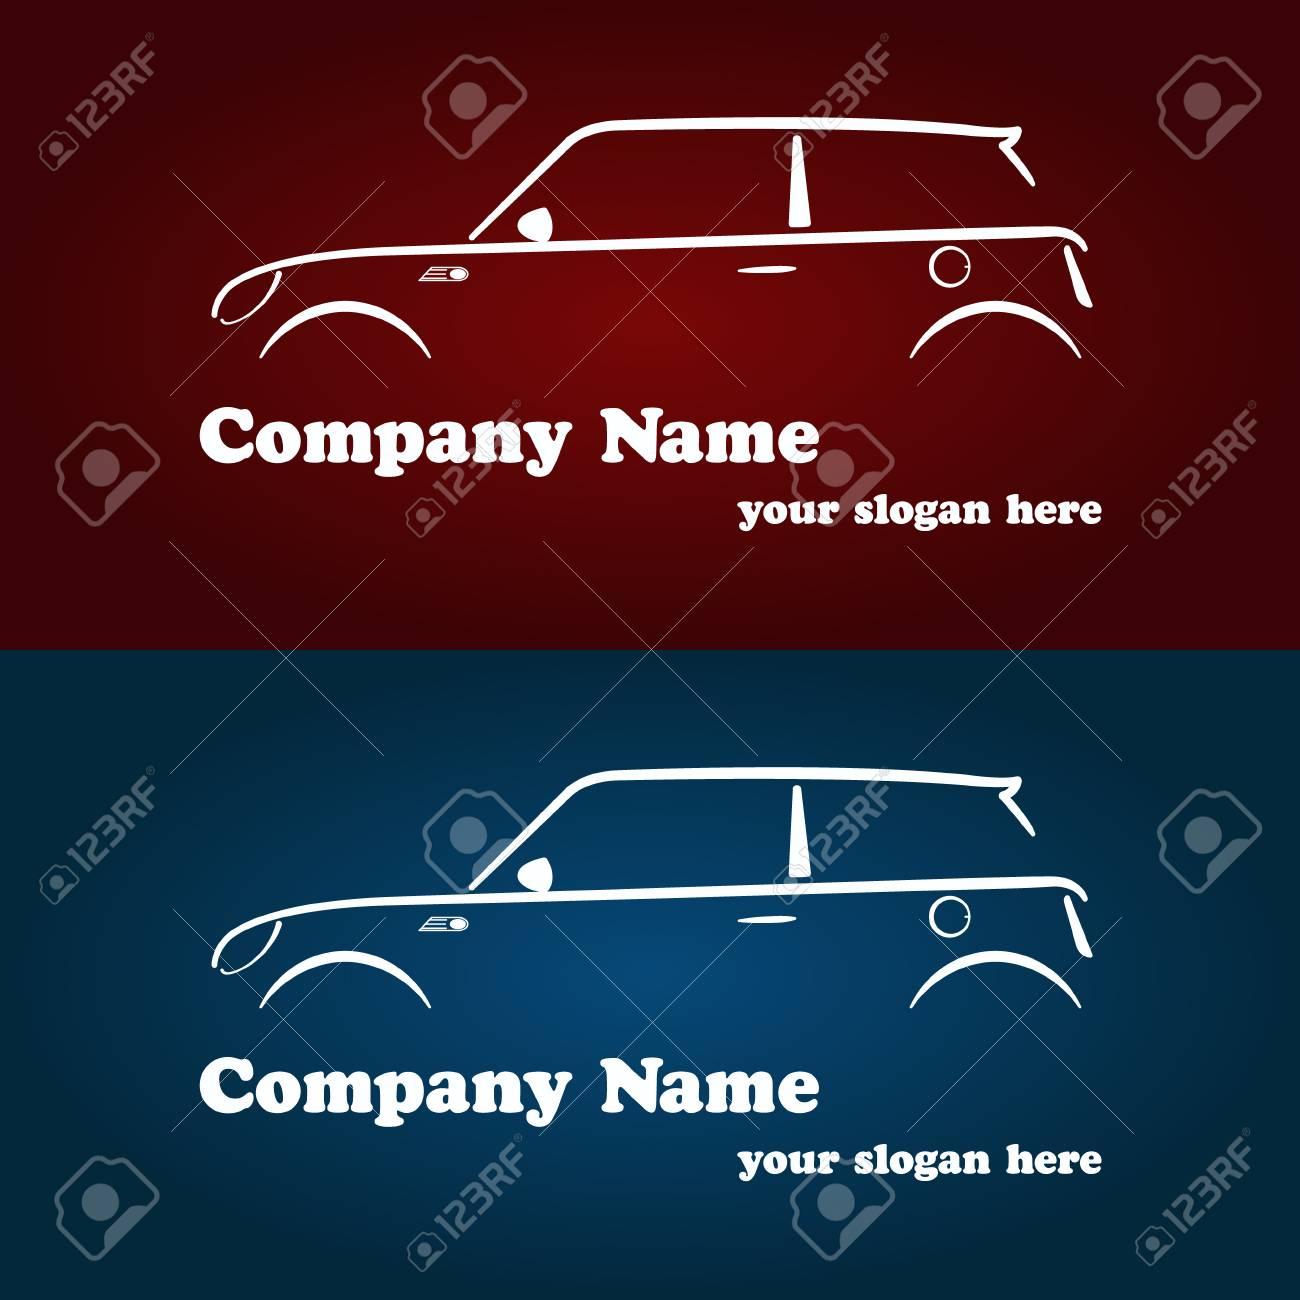 Modeles De Logotype La Societe Automobile Carte Visite